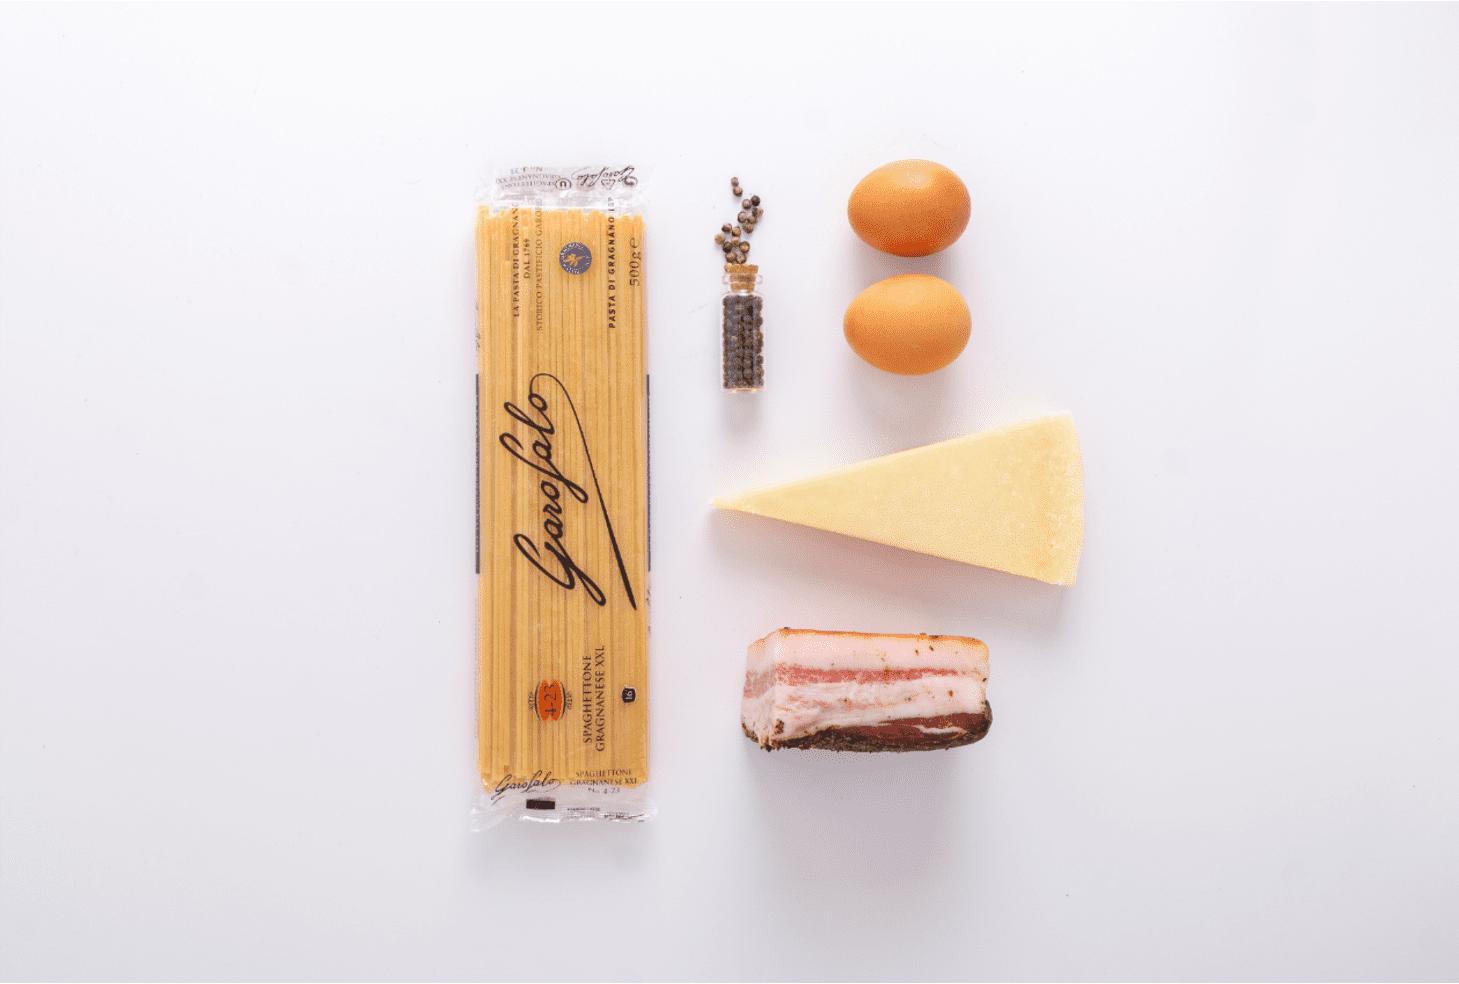 Pasta Garofalo - Un kit